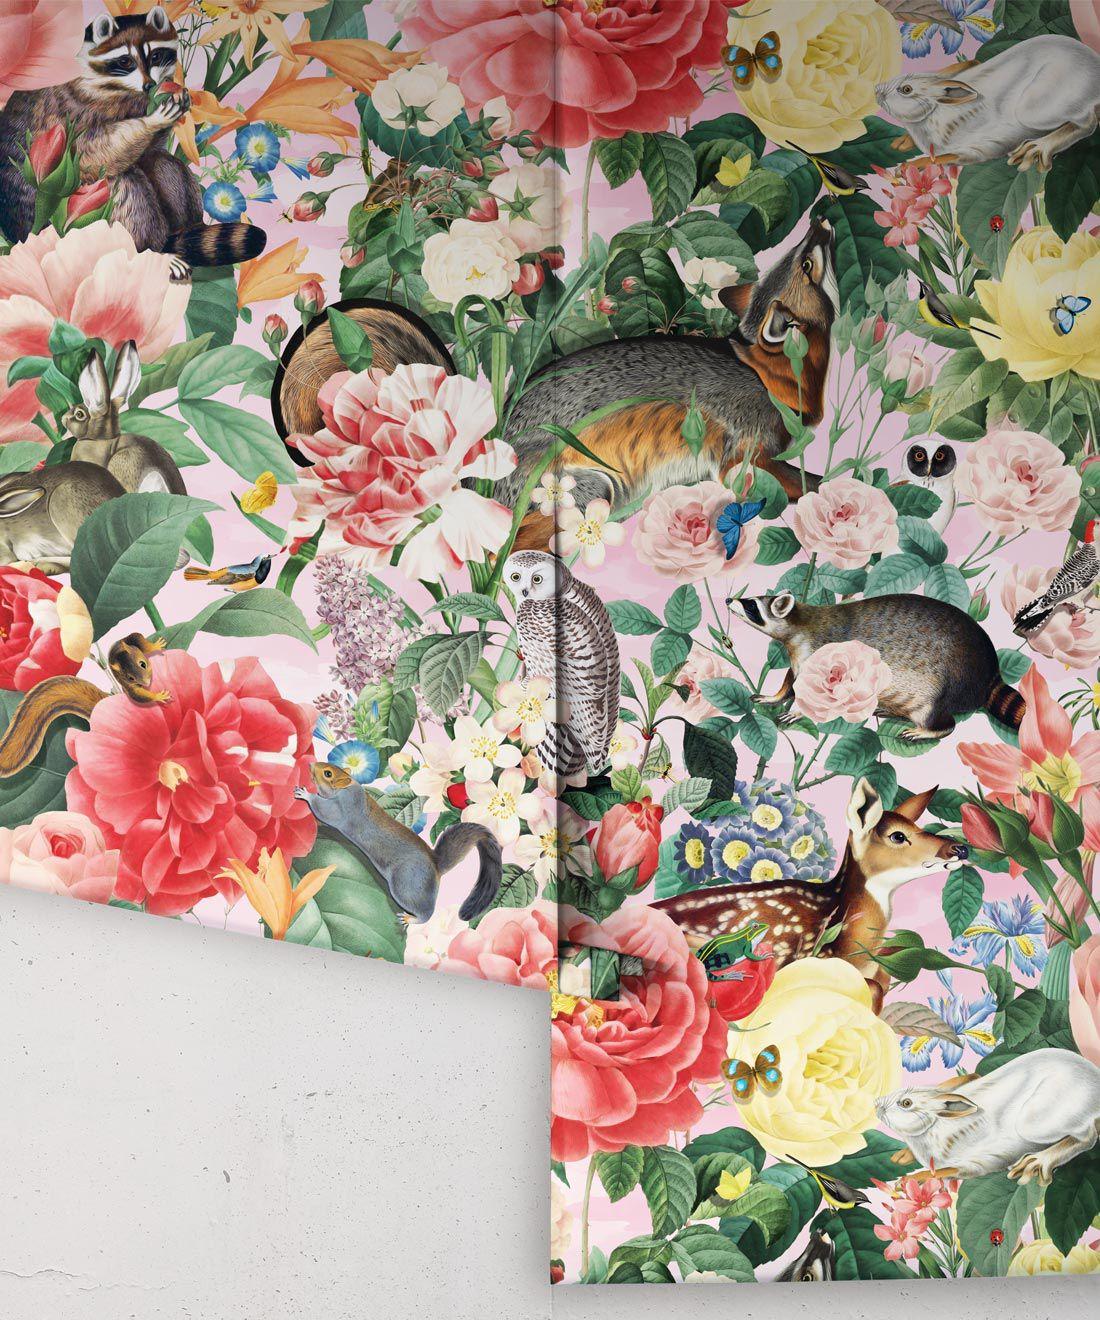 Bush Bouquet Spring Wallpaper • Coral Colored Wallpaper • Assorted Color and Multi-color wallpaper • Floral Wallpaper • Wallpaper With Forest Animals • Rolls